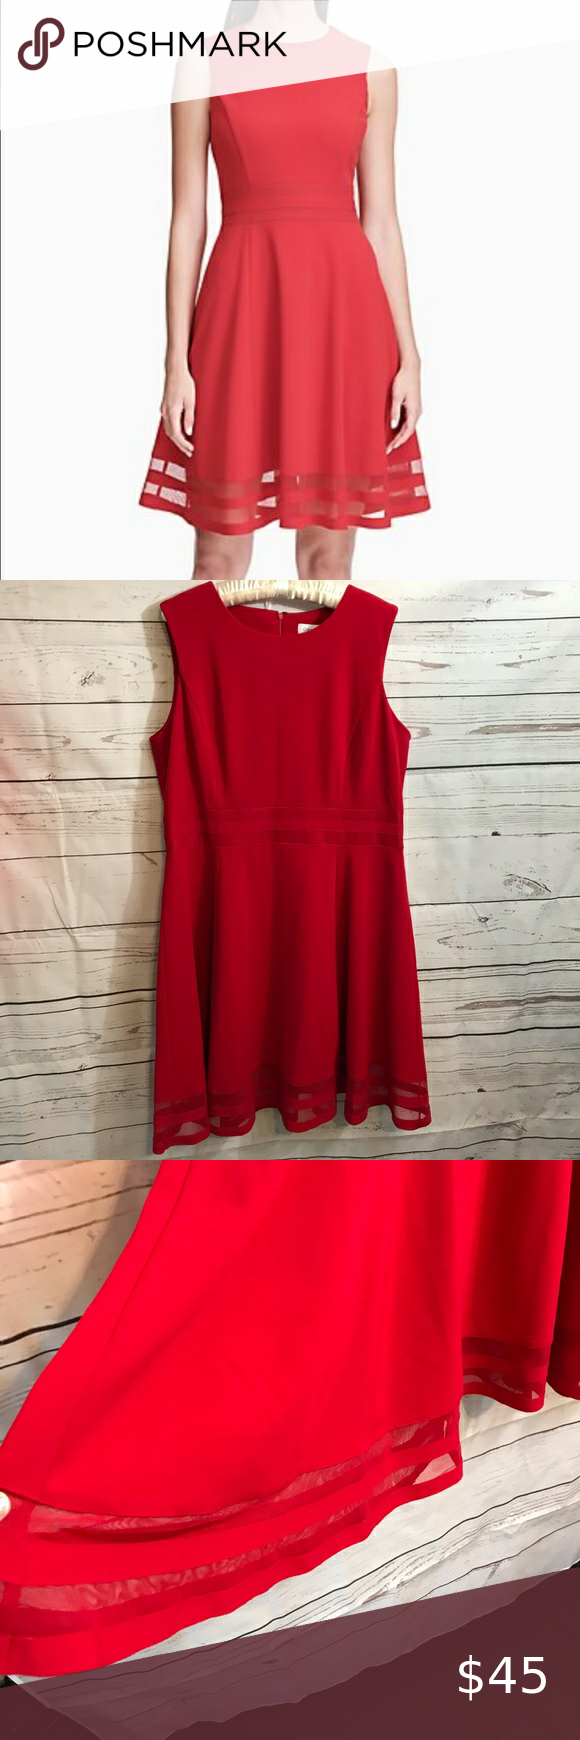 15++ Red dress size 16 ideas